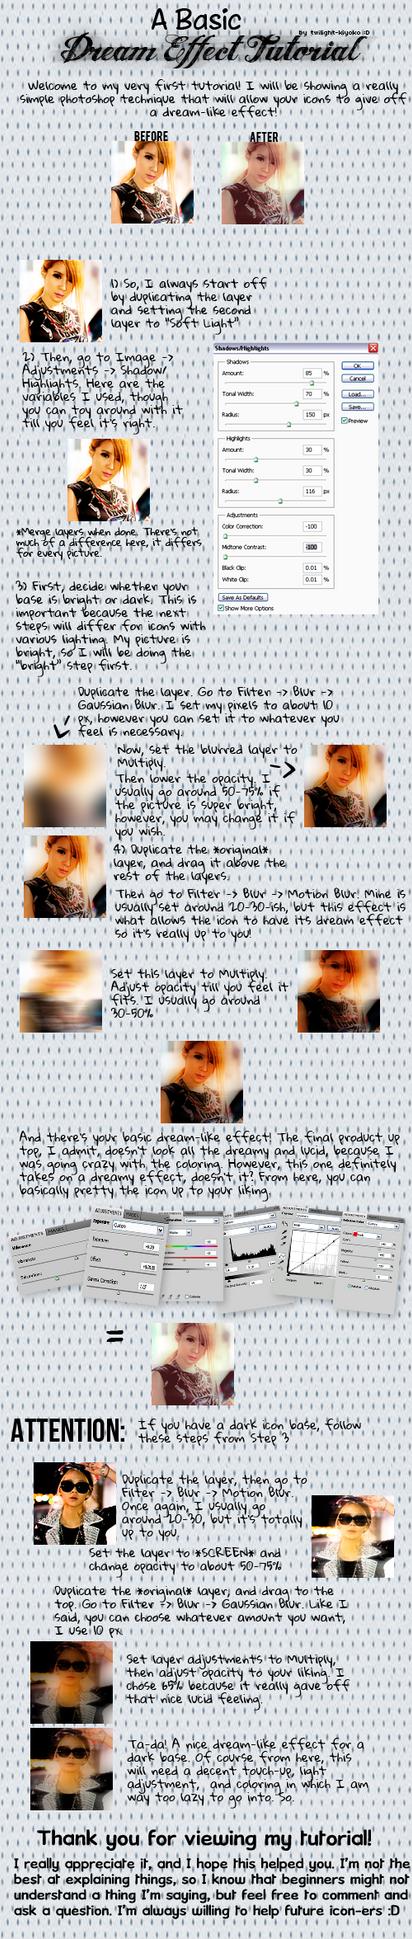 Basic Dream Effect Tutorial by Twilight-Kiyoko